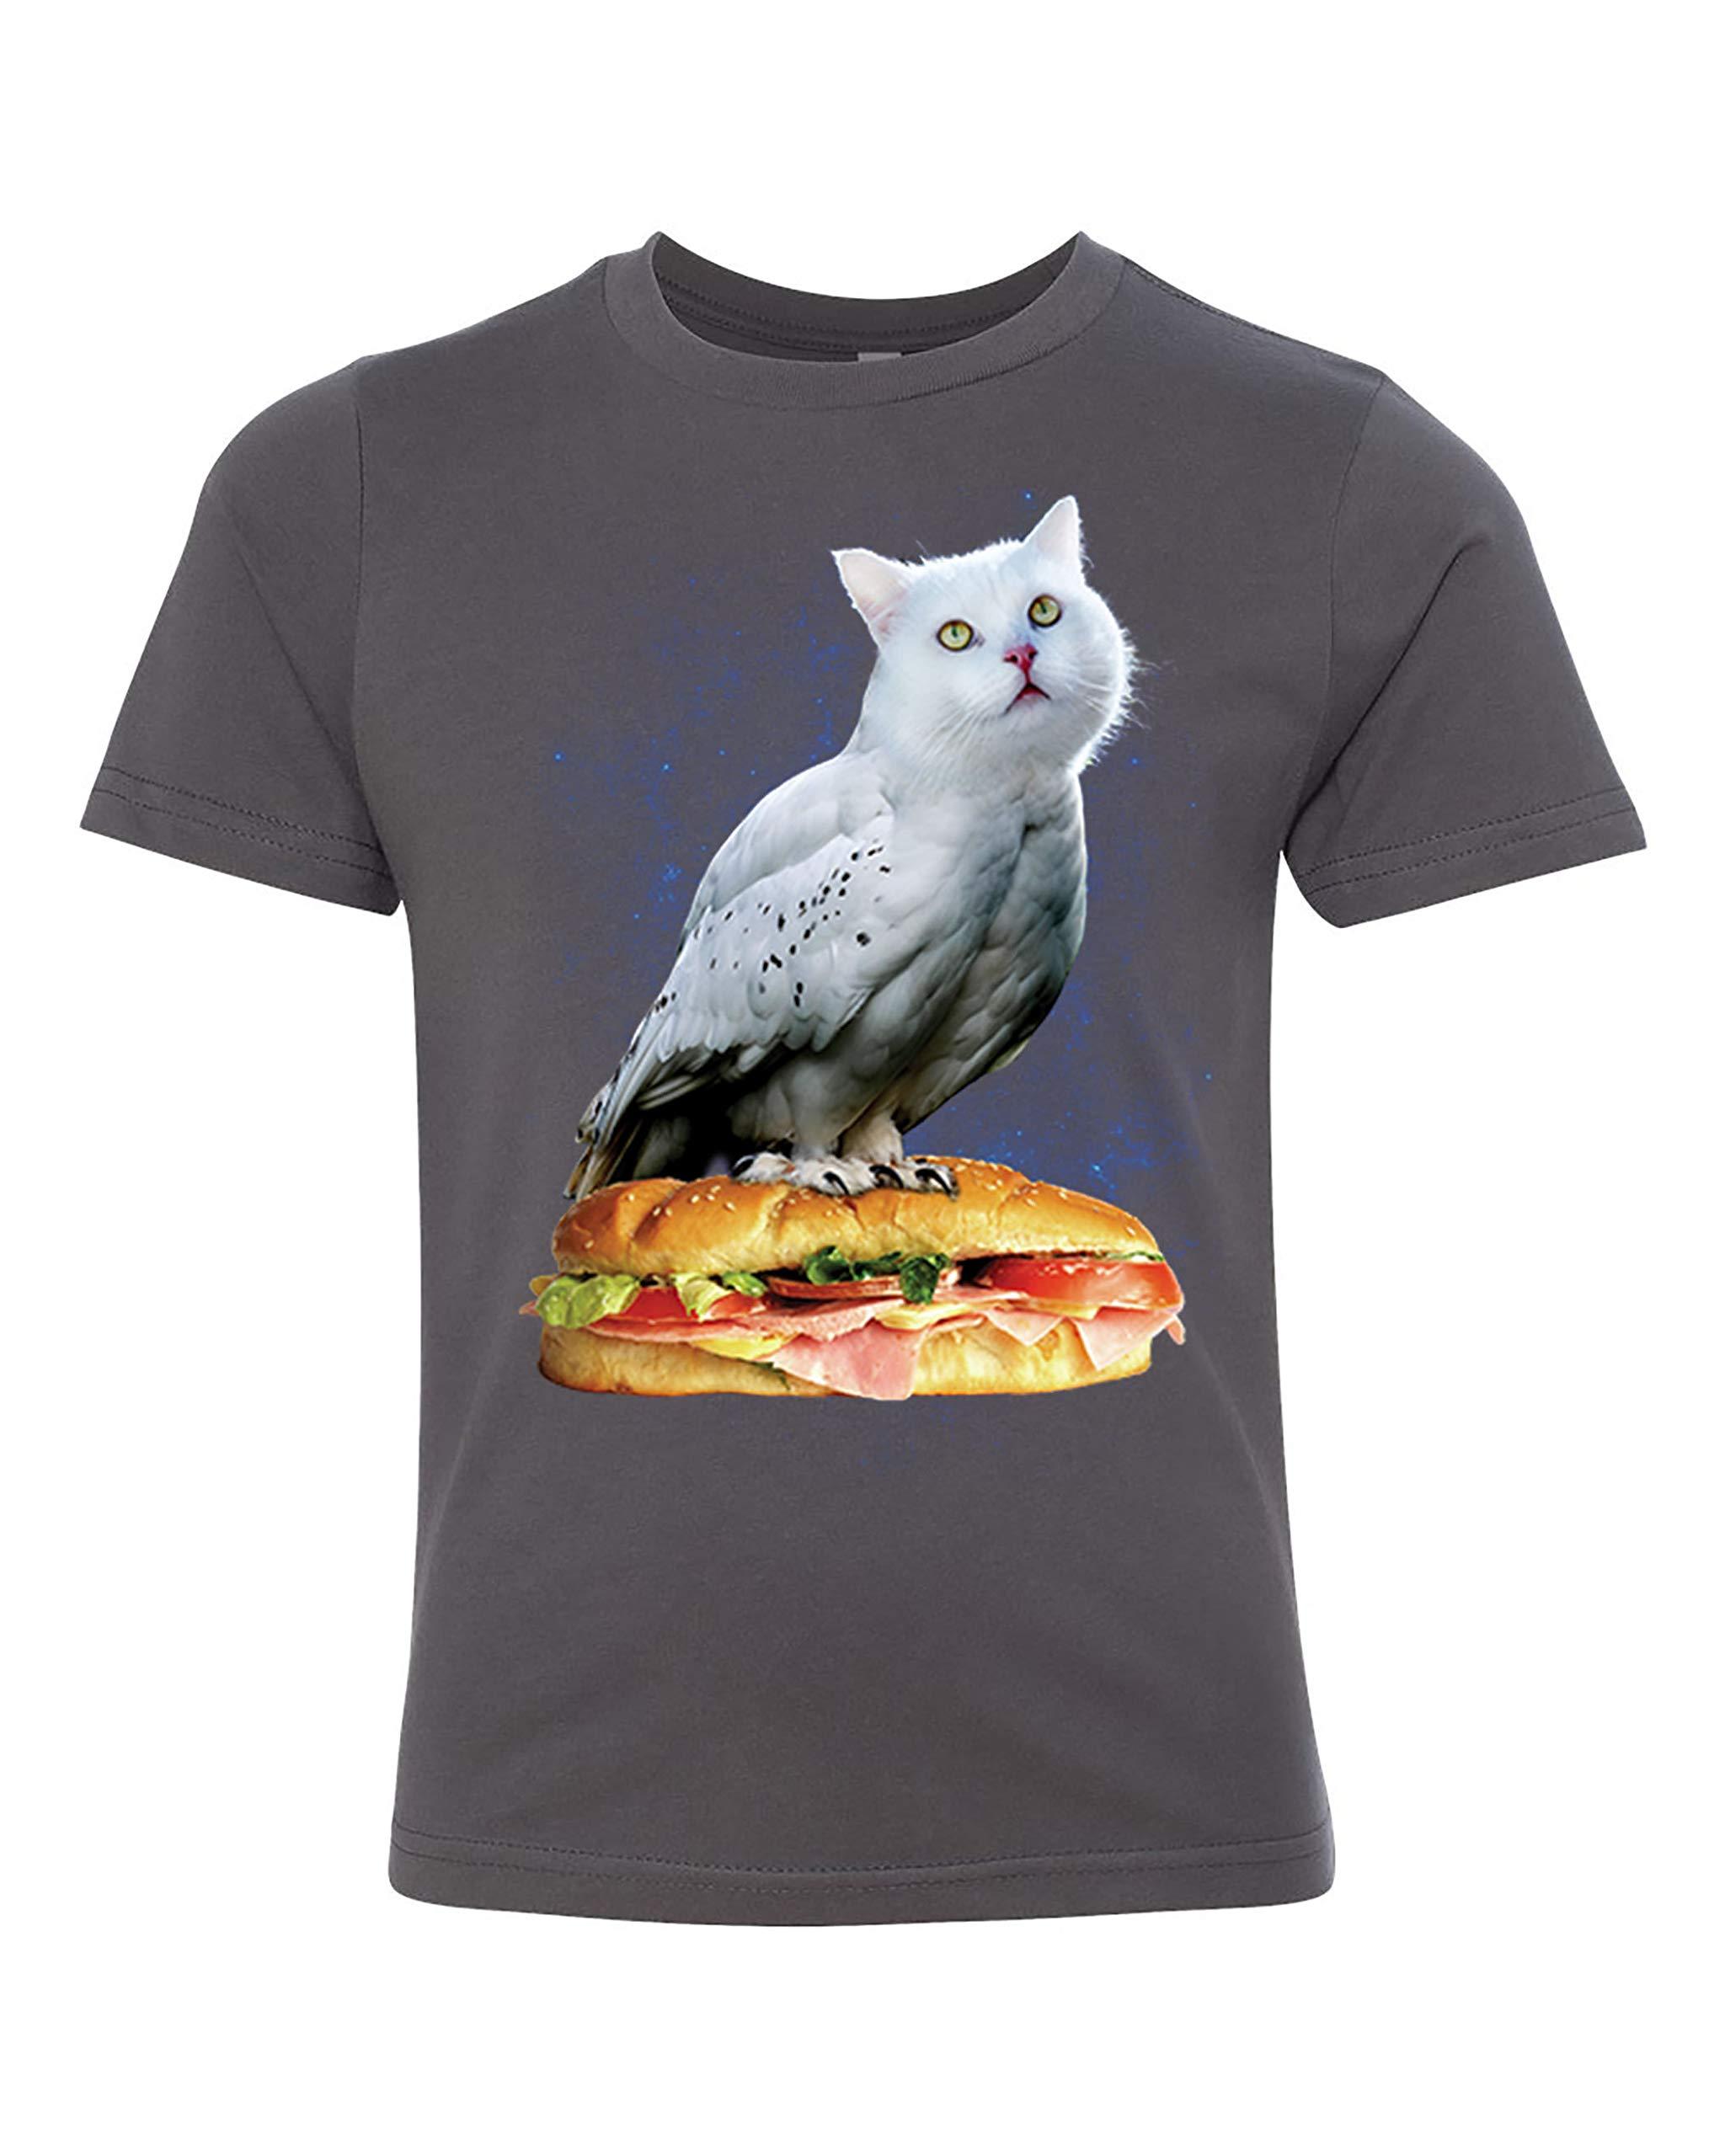 Funny Shirt Cat Owl Sub Sandwich Meowl Crew Neck T Shirt Novelty Unisex Shirts For